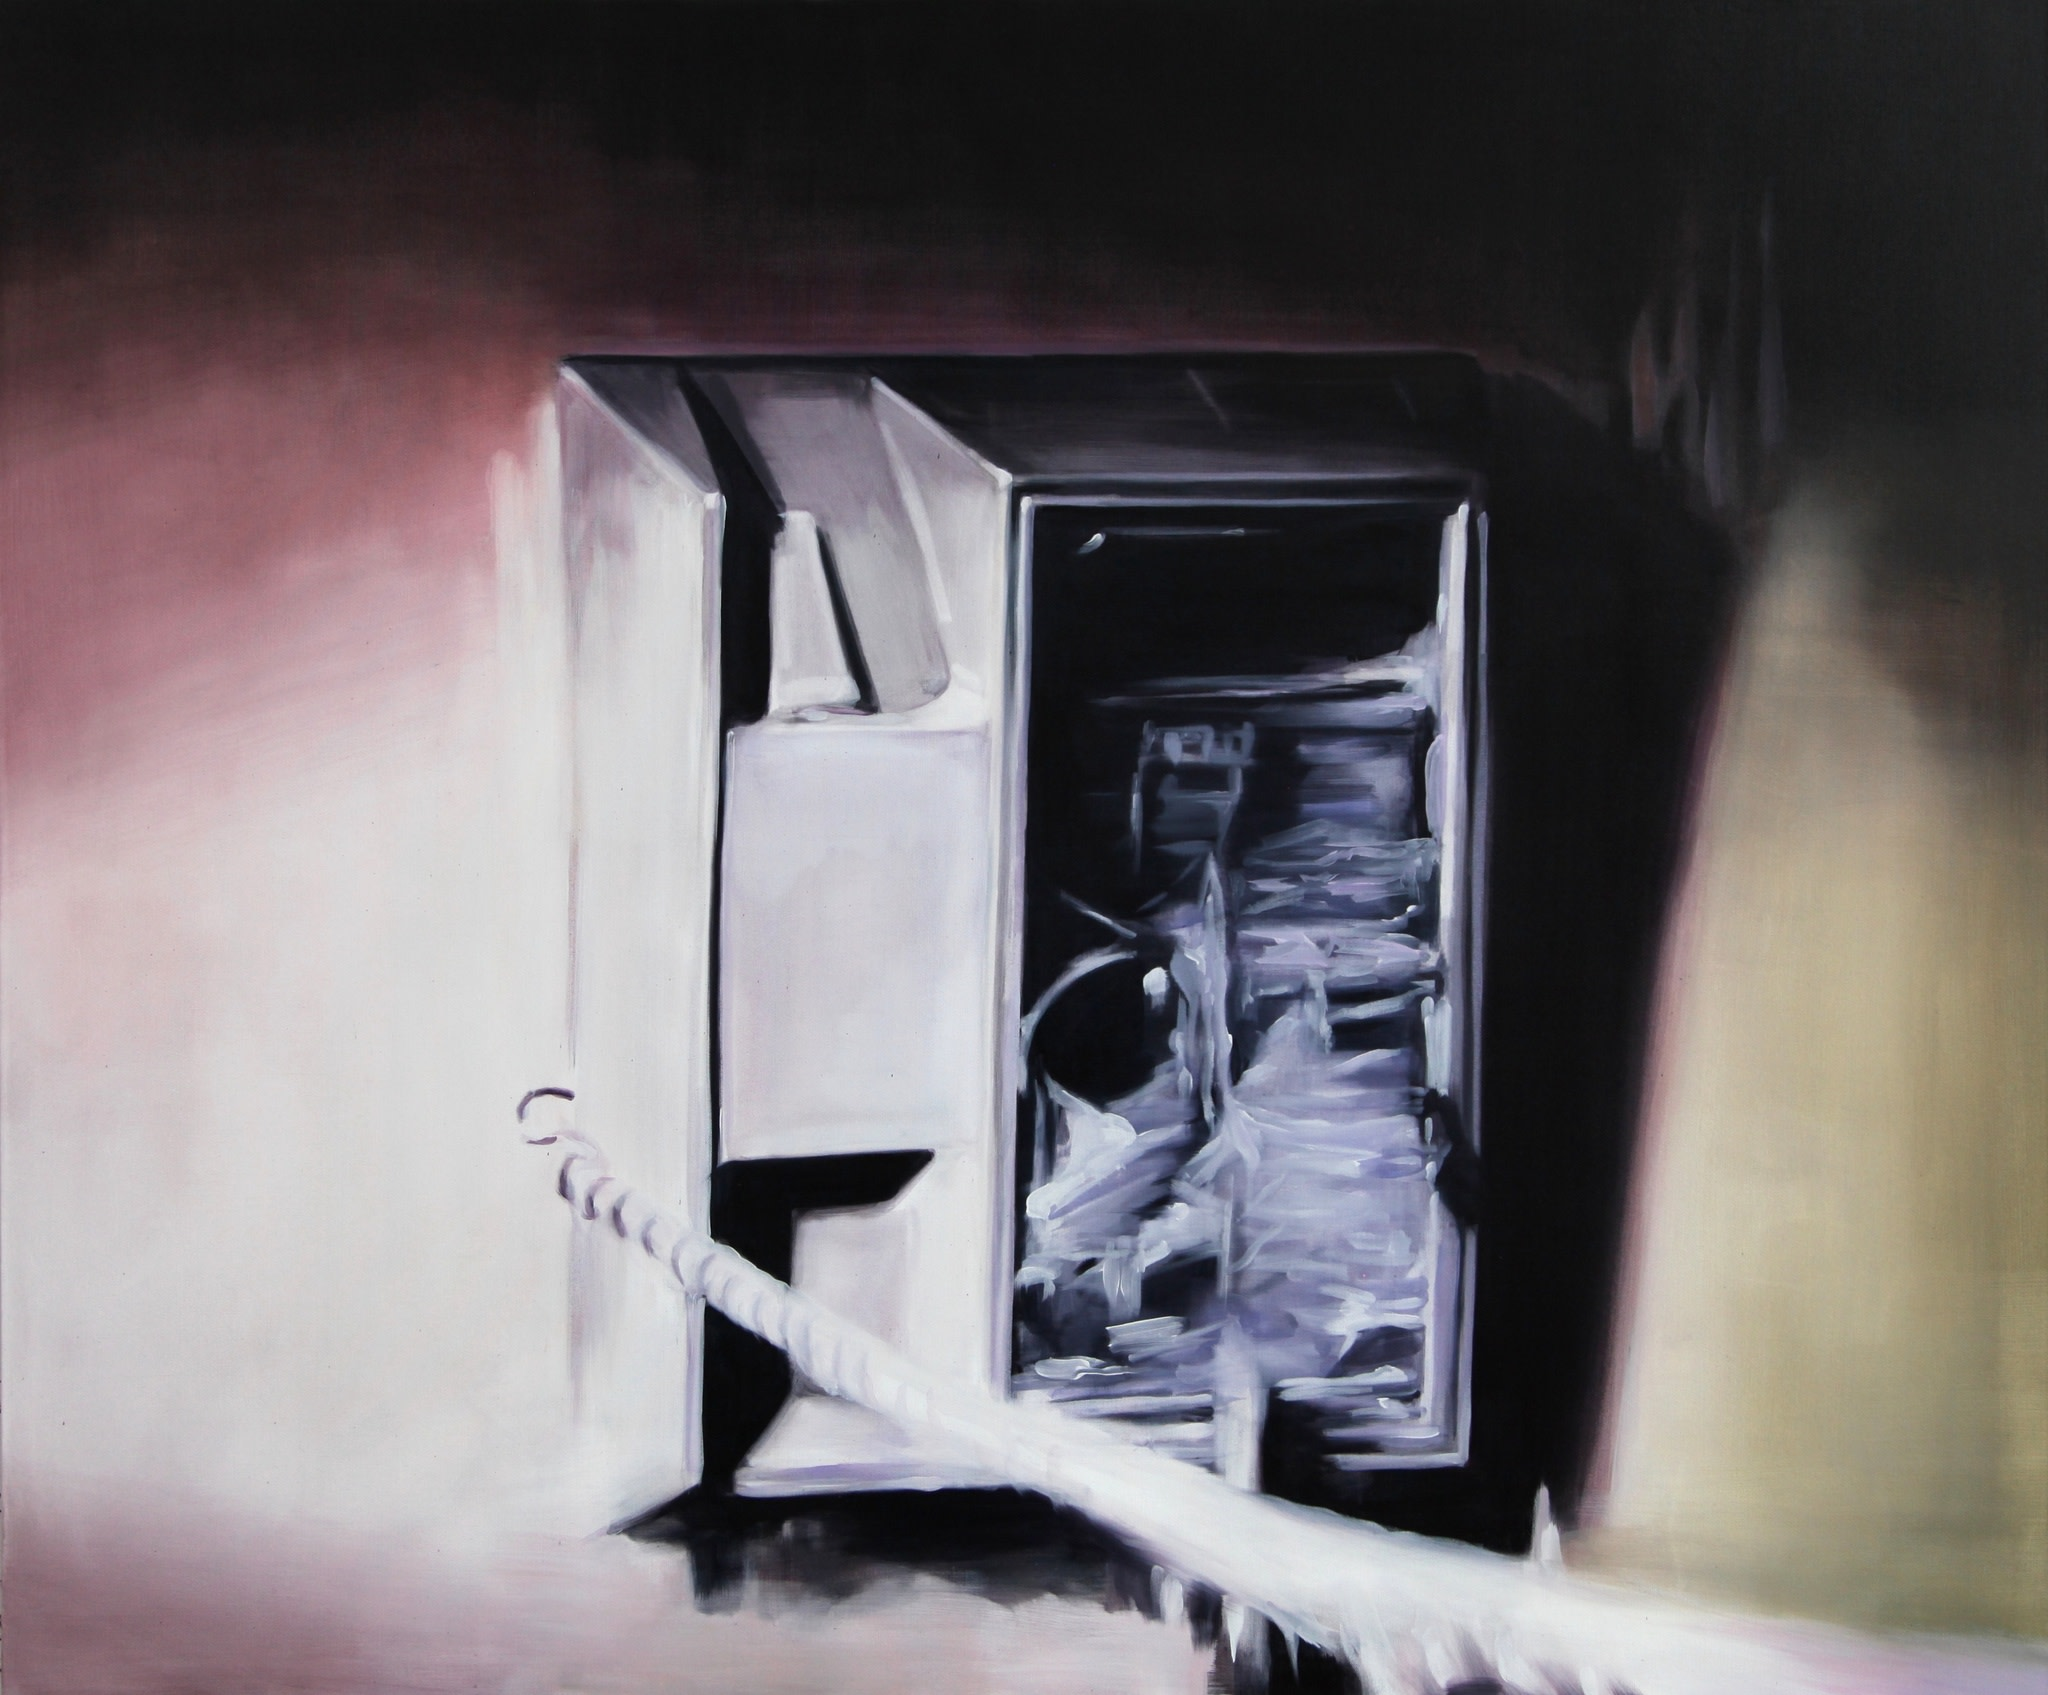 <span class=&#34;link fancybox-details-link&#34;><a href=&#34;/artists/14-rachel-lancaster/works/8789/&#34;>View Detail Page</a></span><div class=&#34;artist&#34;><strong>Rachel Lancaster</strong></div> <div class=&#34;title&#34;>untitled, 2015</div> <div class=&#34;medium&#34;>Oil on canvas</div> <div class=&#34;dimensions&#34;>154 x 183 cm<br />60 5/8 x 72 1/8 in</div><div class=&#34;copyright_line&#34;>Copyright The Artist</div>